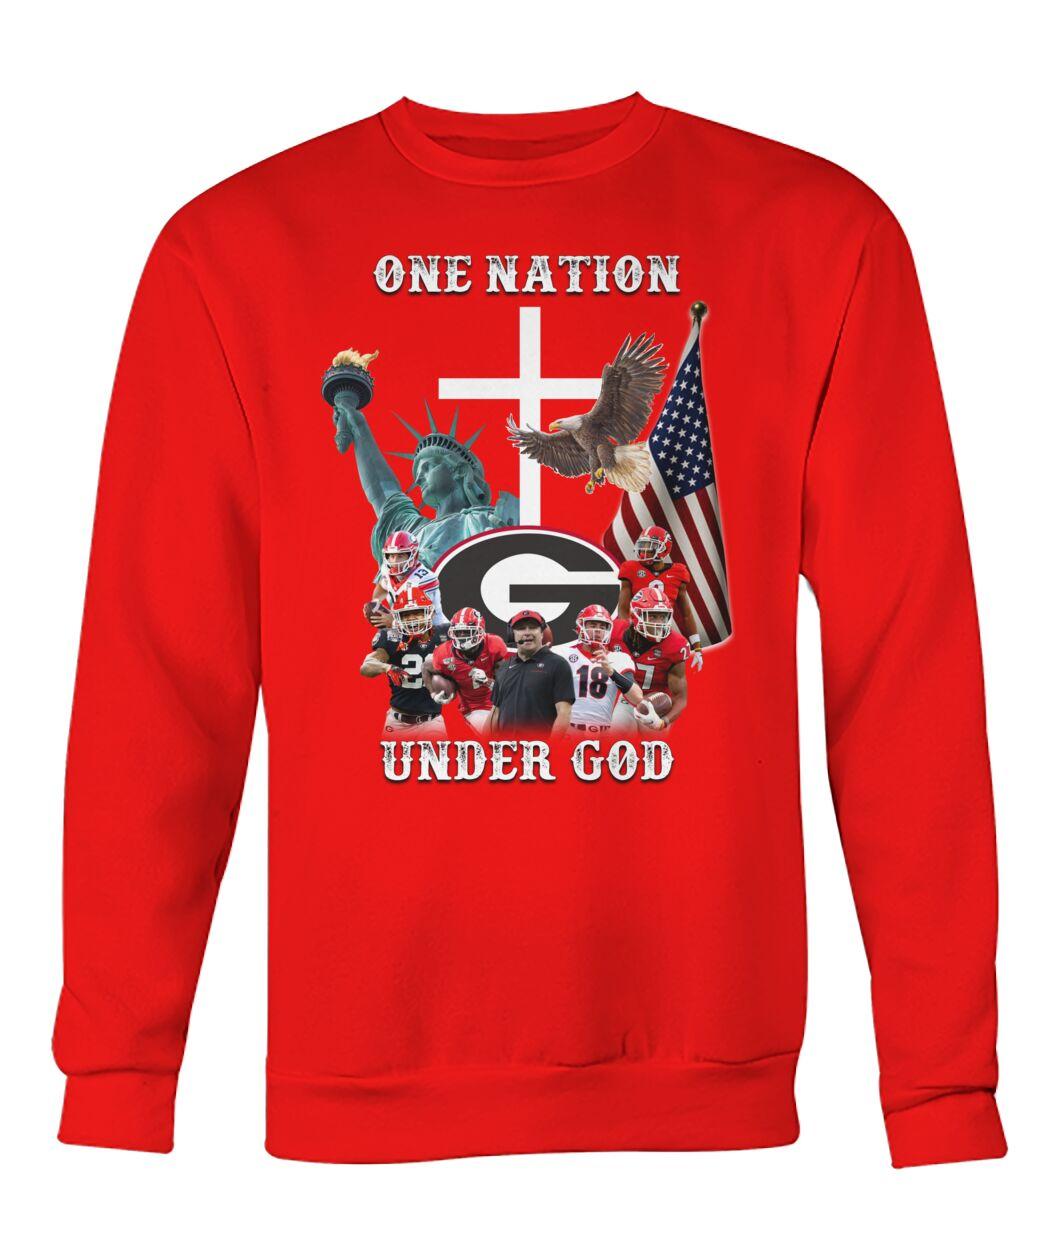 Georgia Bulldogs football One nation under god shirt 12